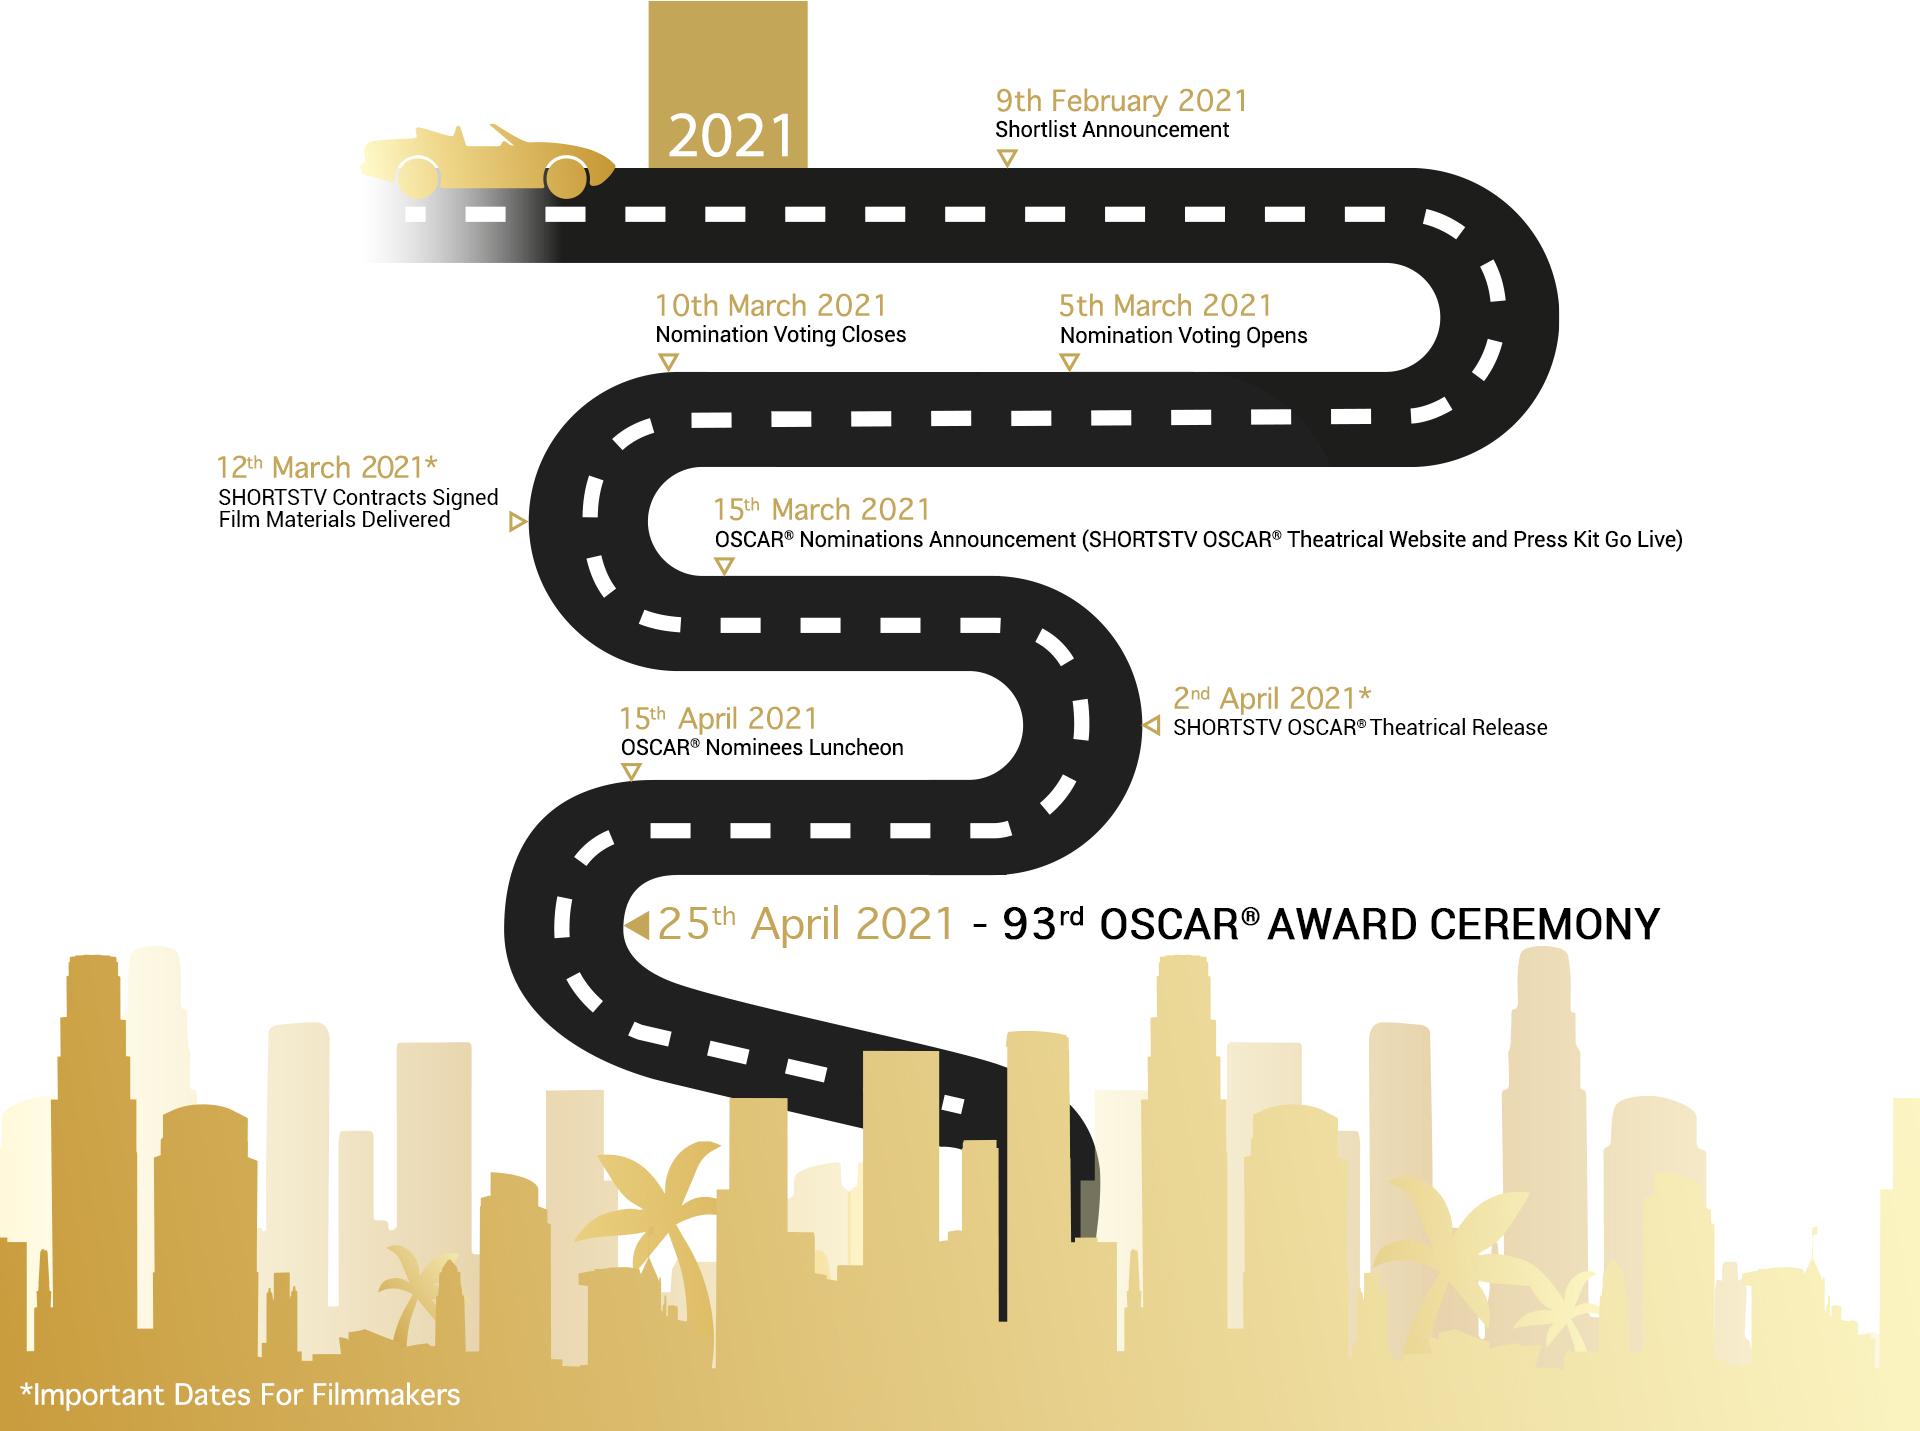 Oscars®Timeline